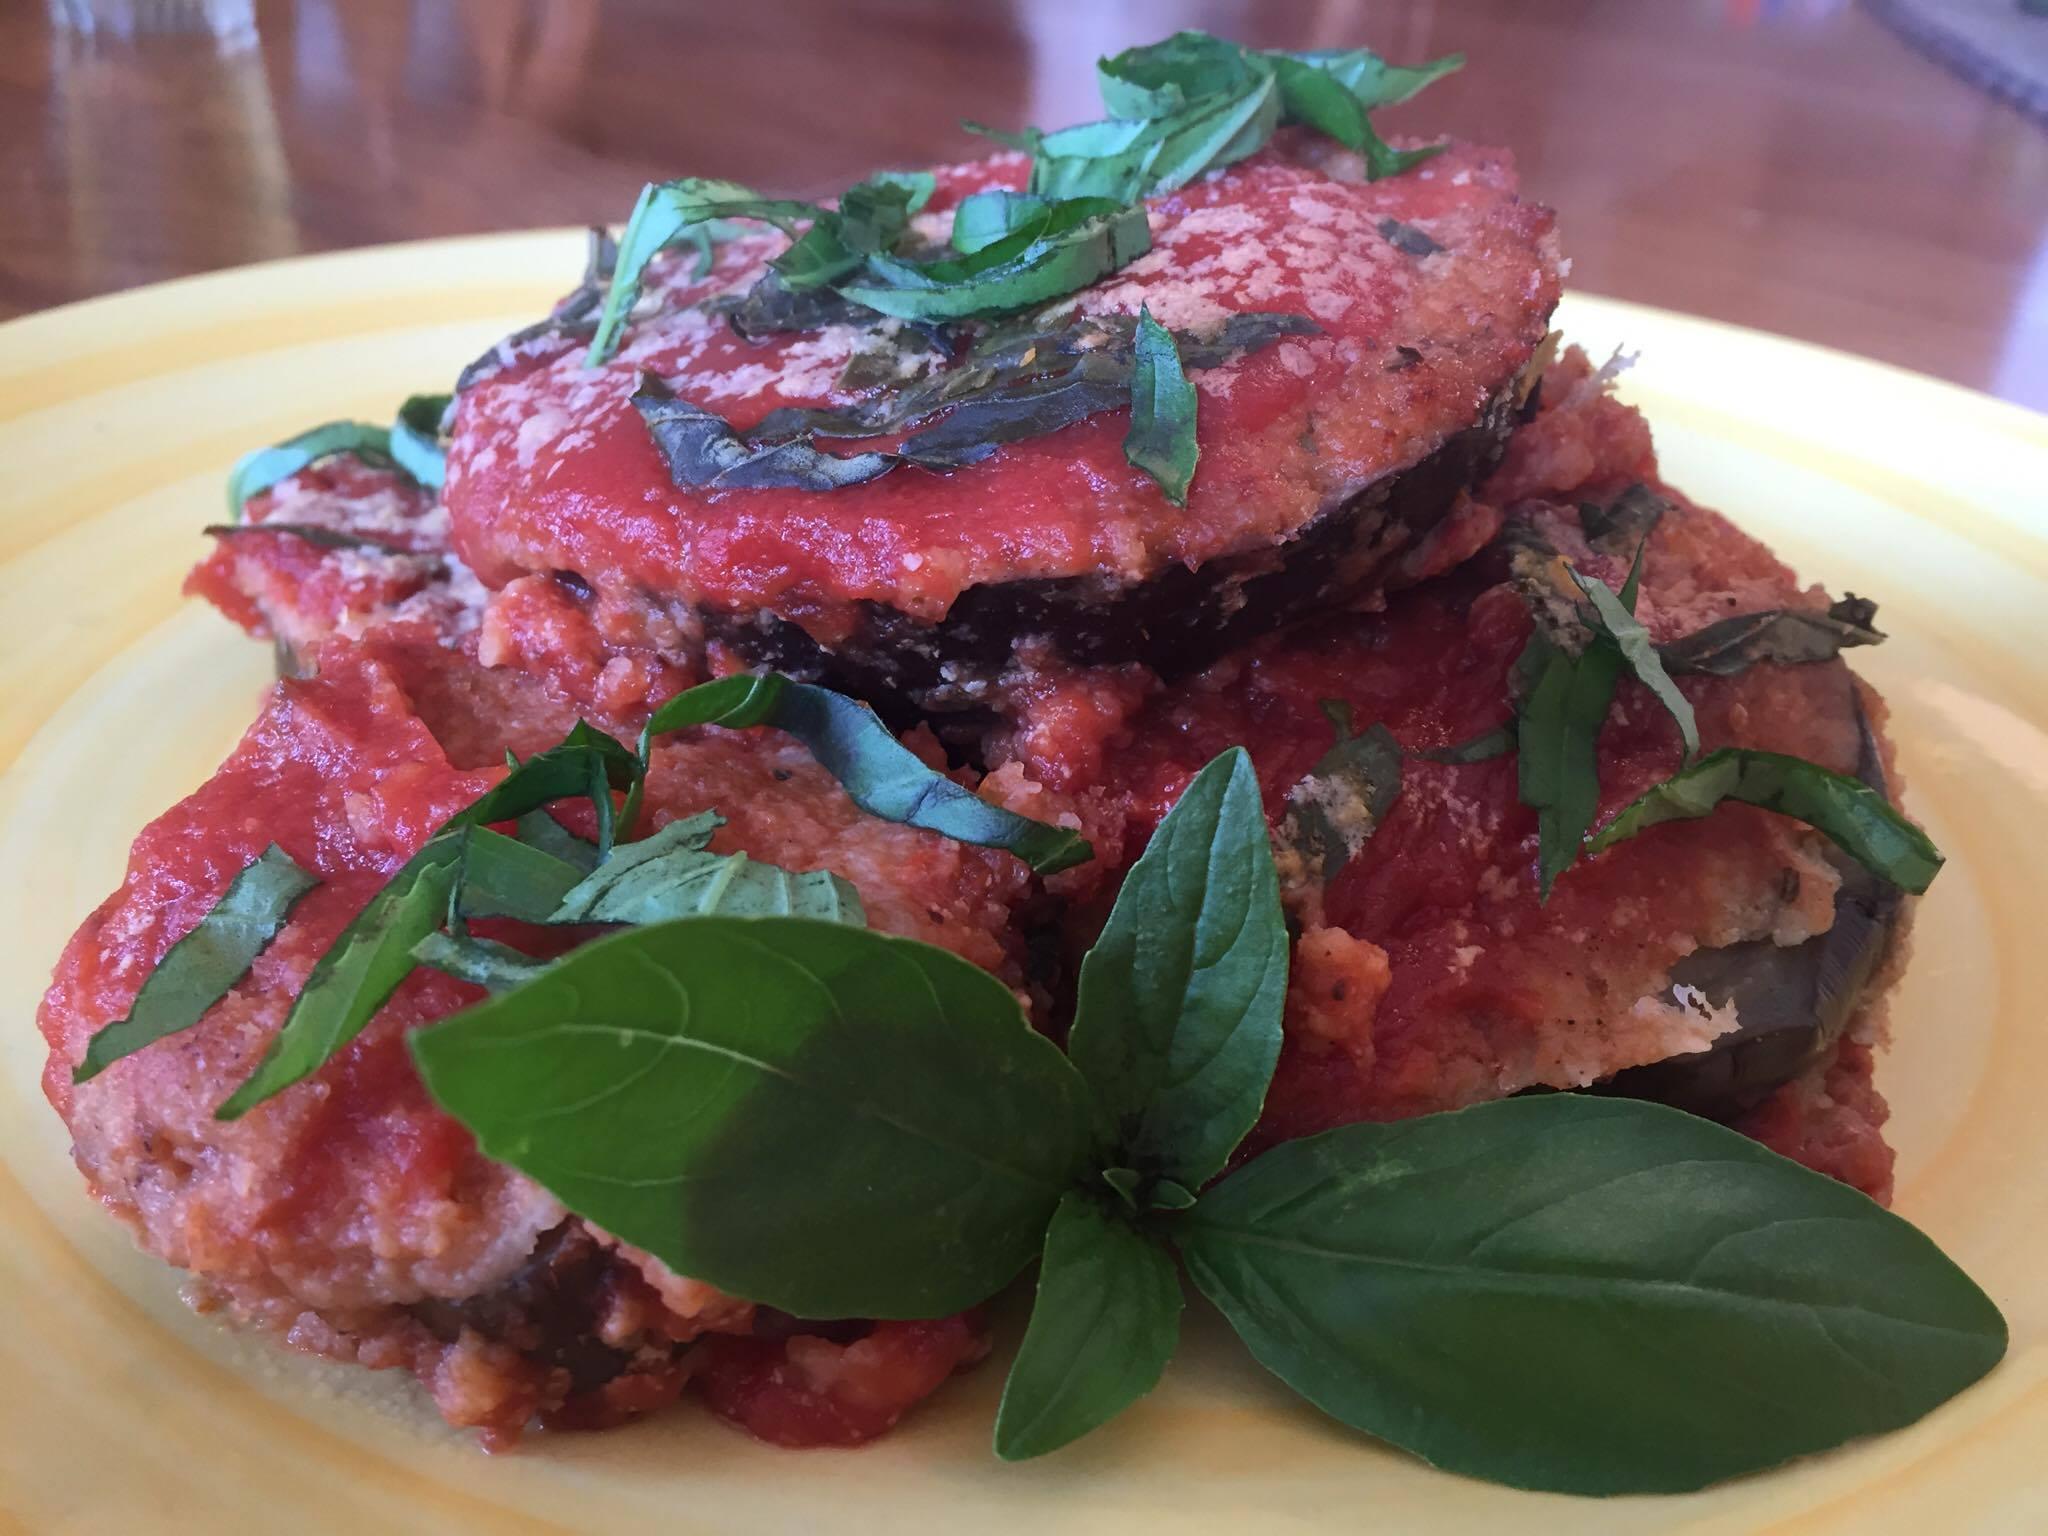 whole-foods-plant-based-diet-eggplant-parmesan-recipe-homemade